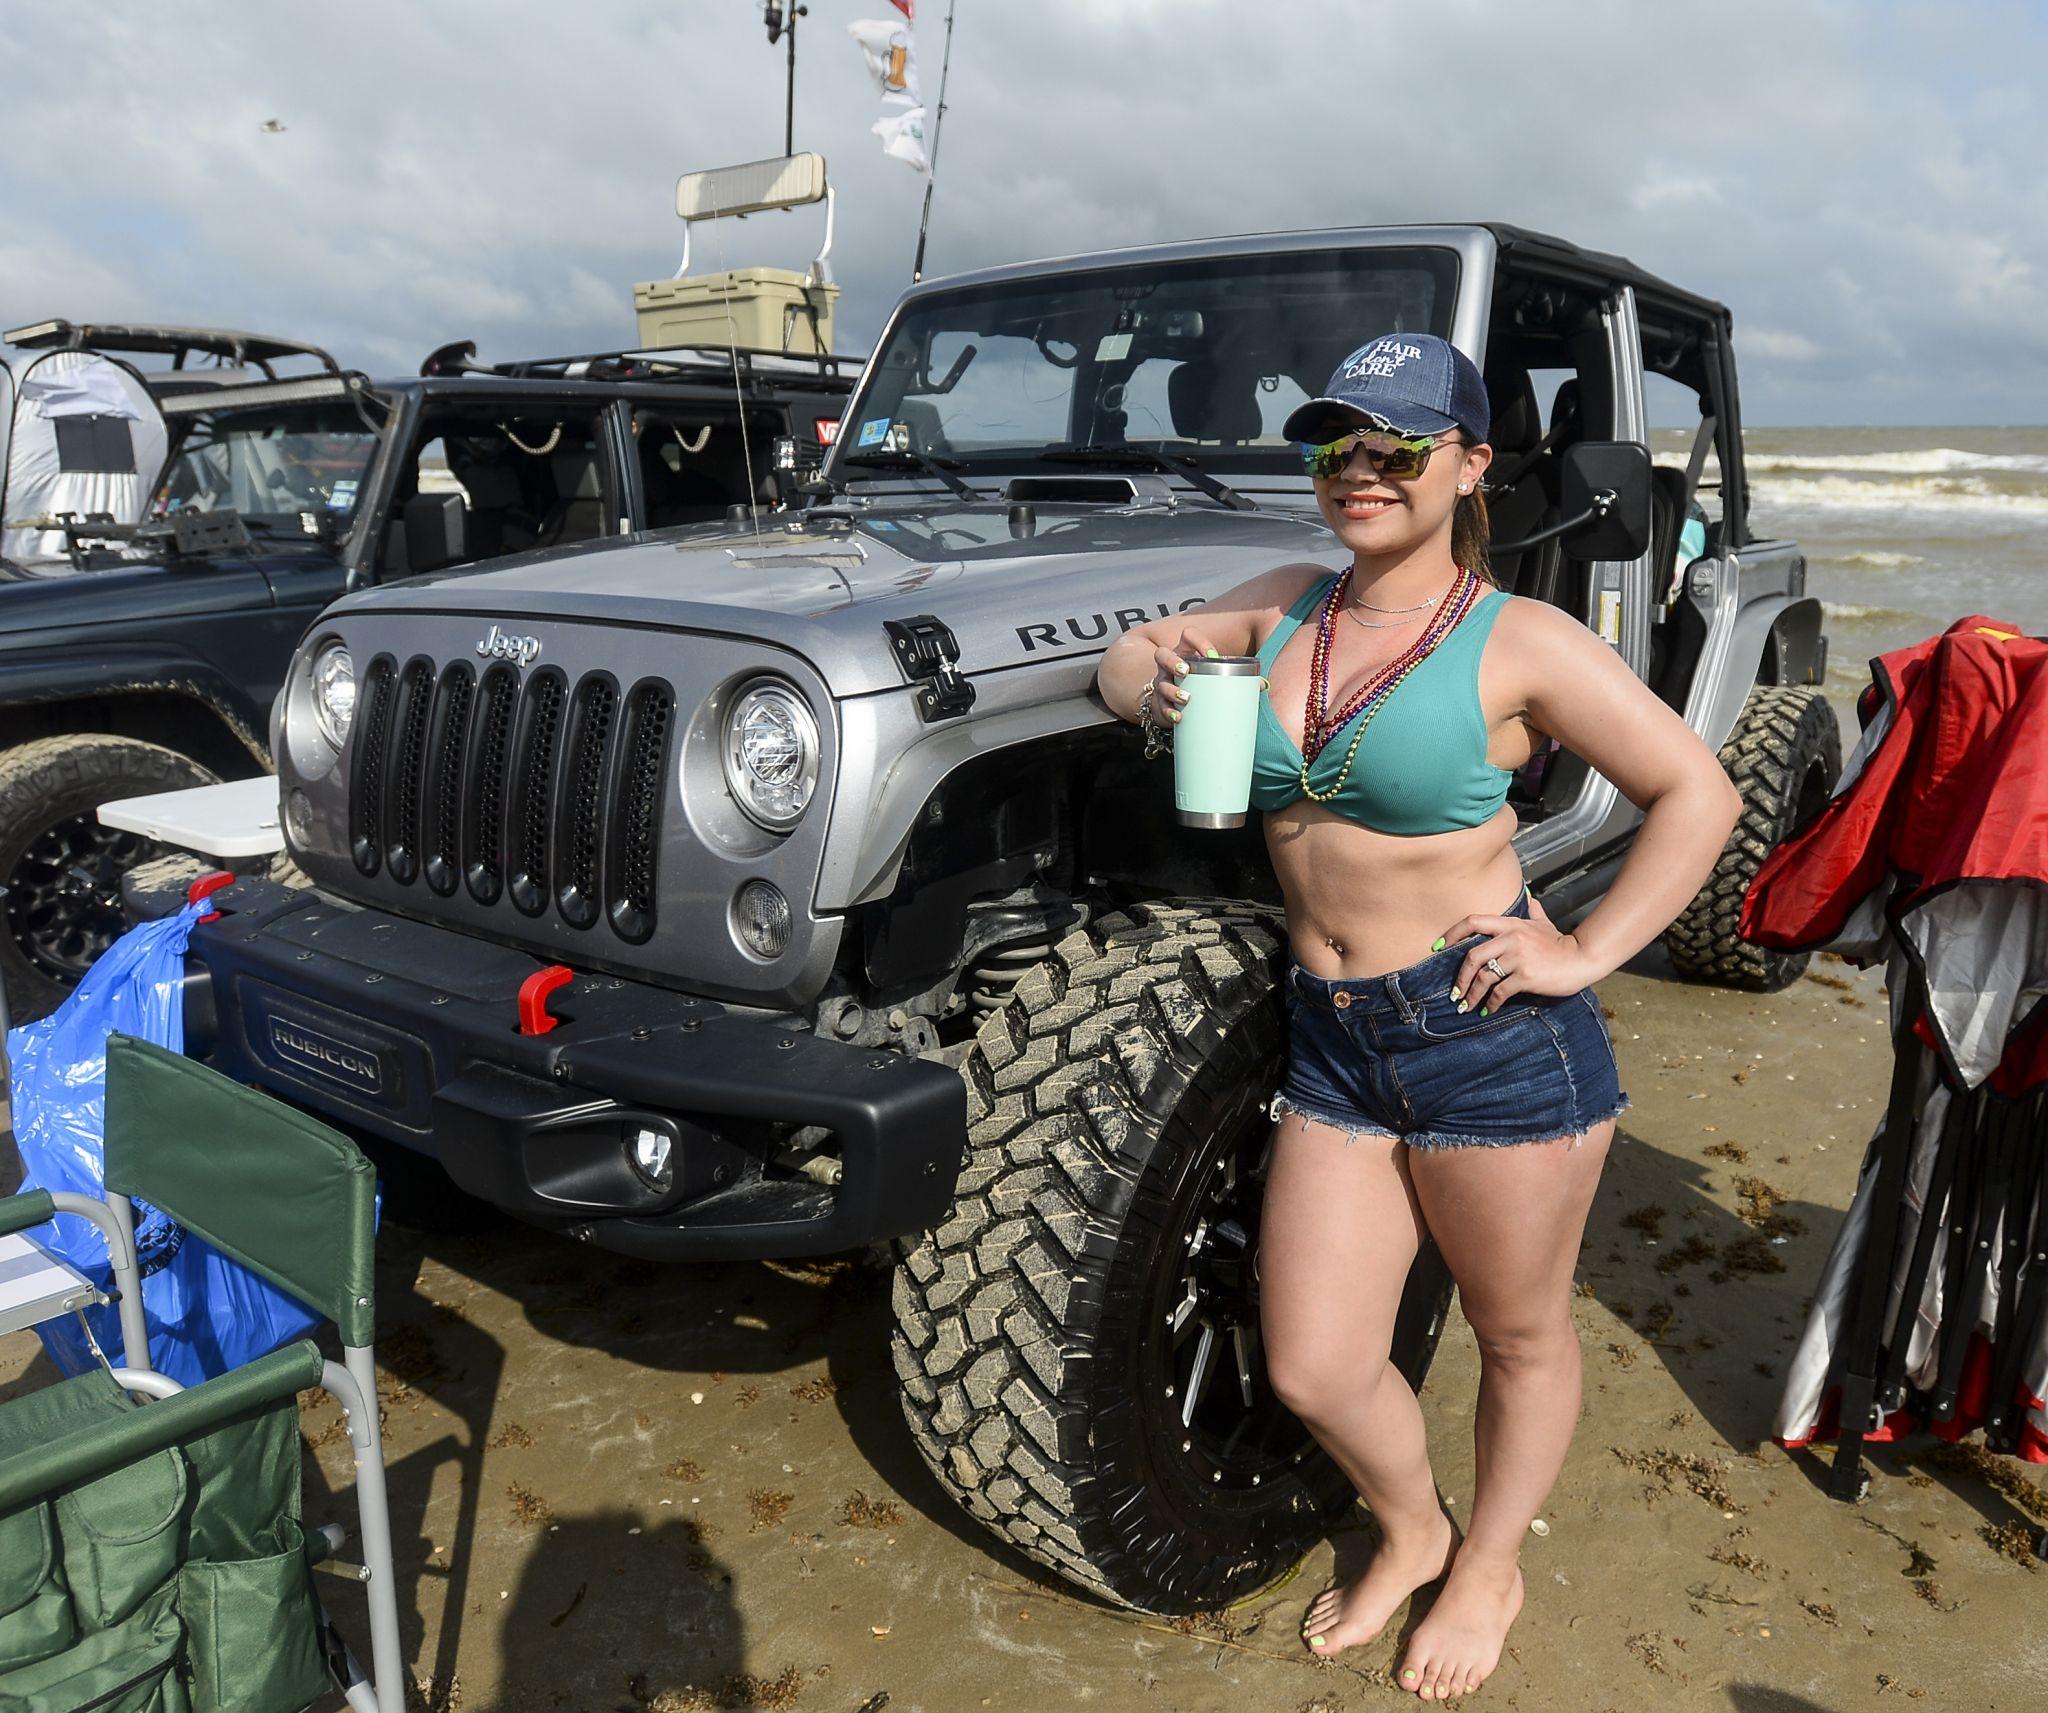 Wild naked beach parties tubes free best porno gallery